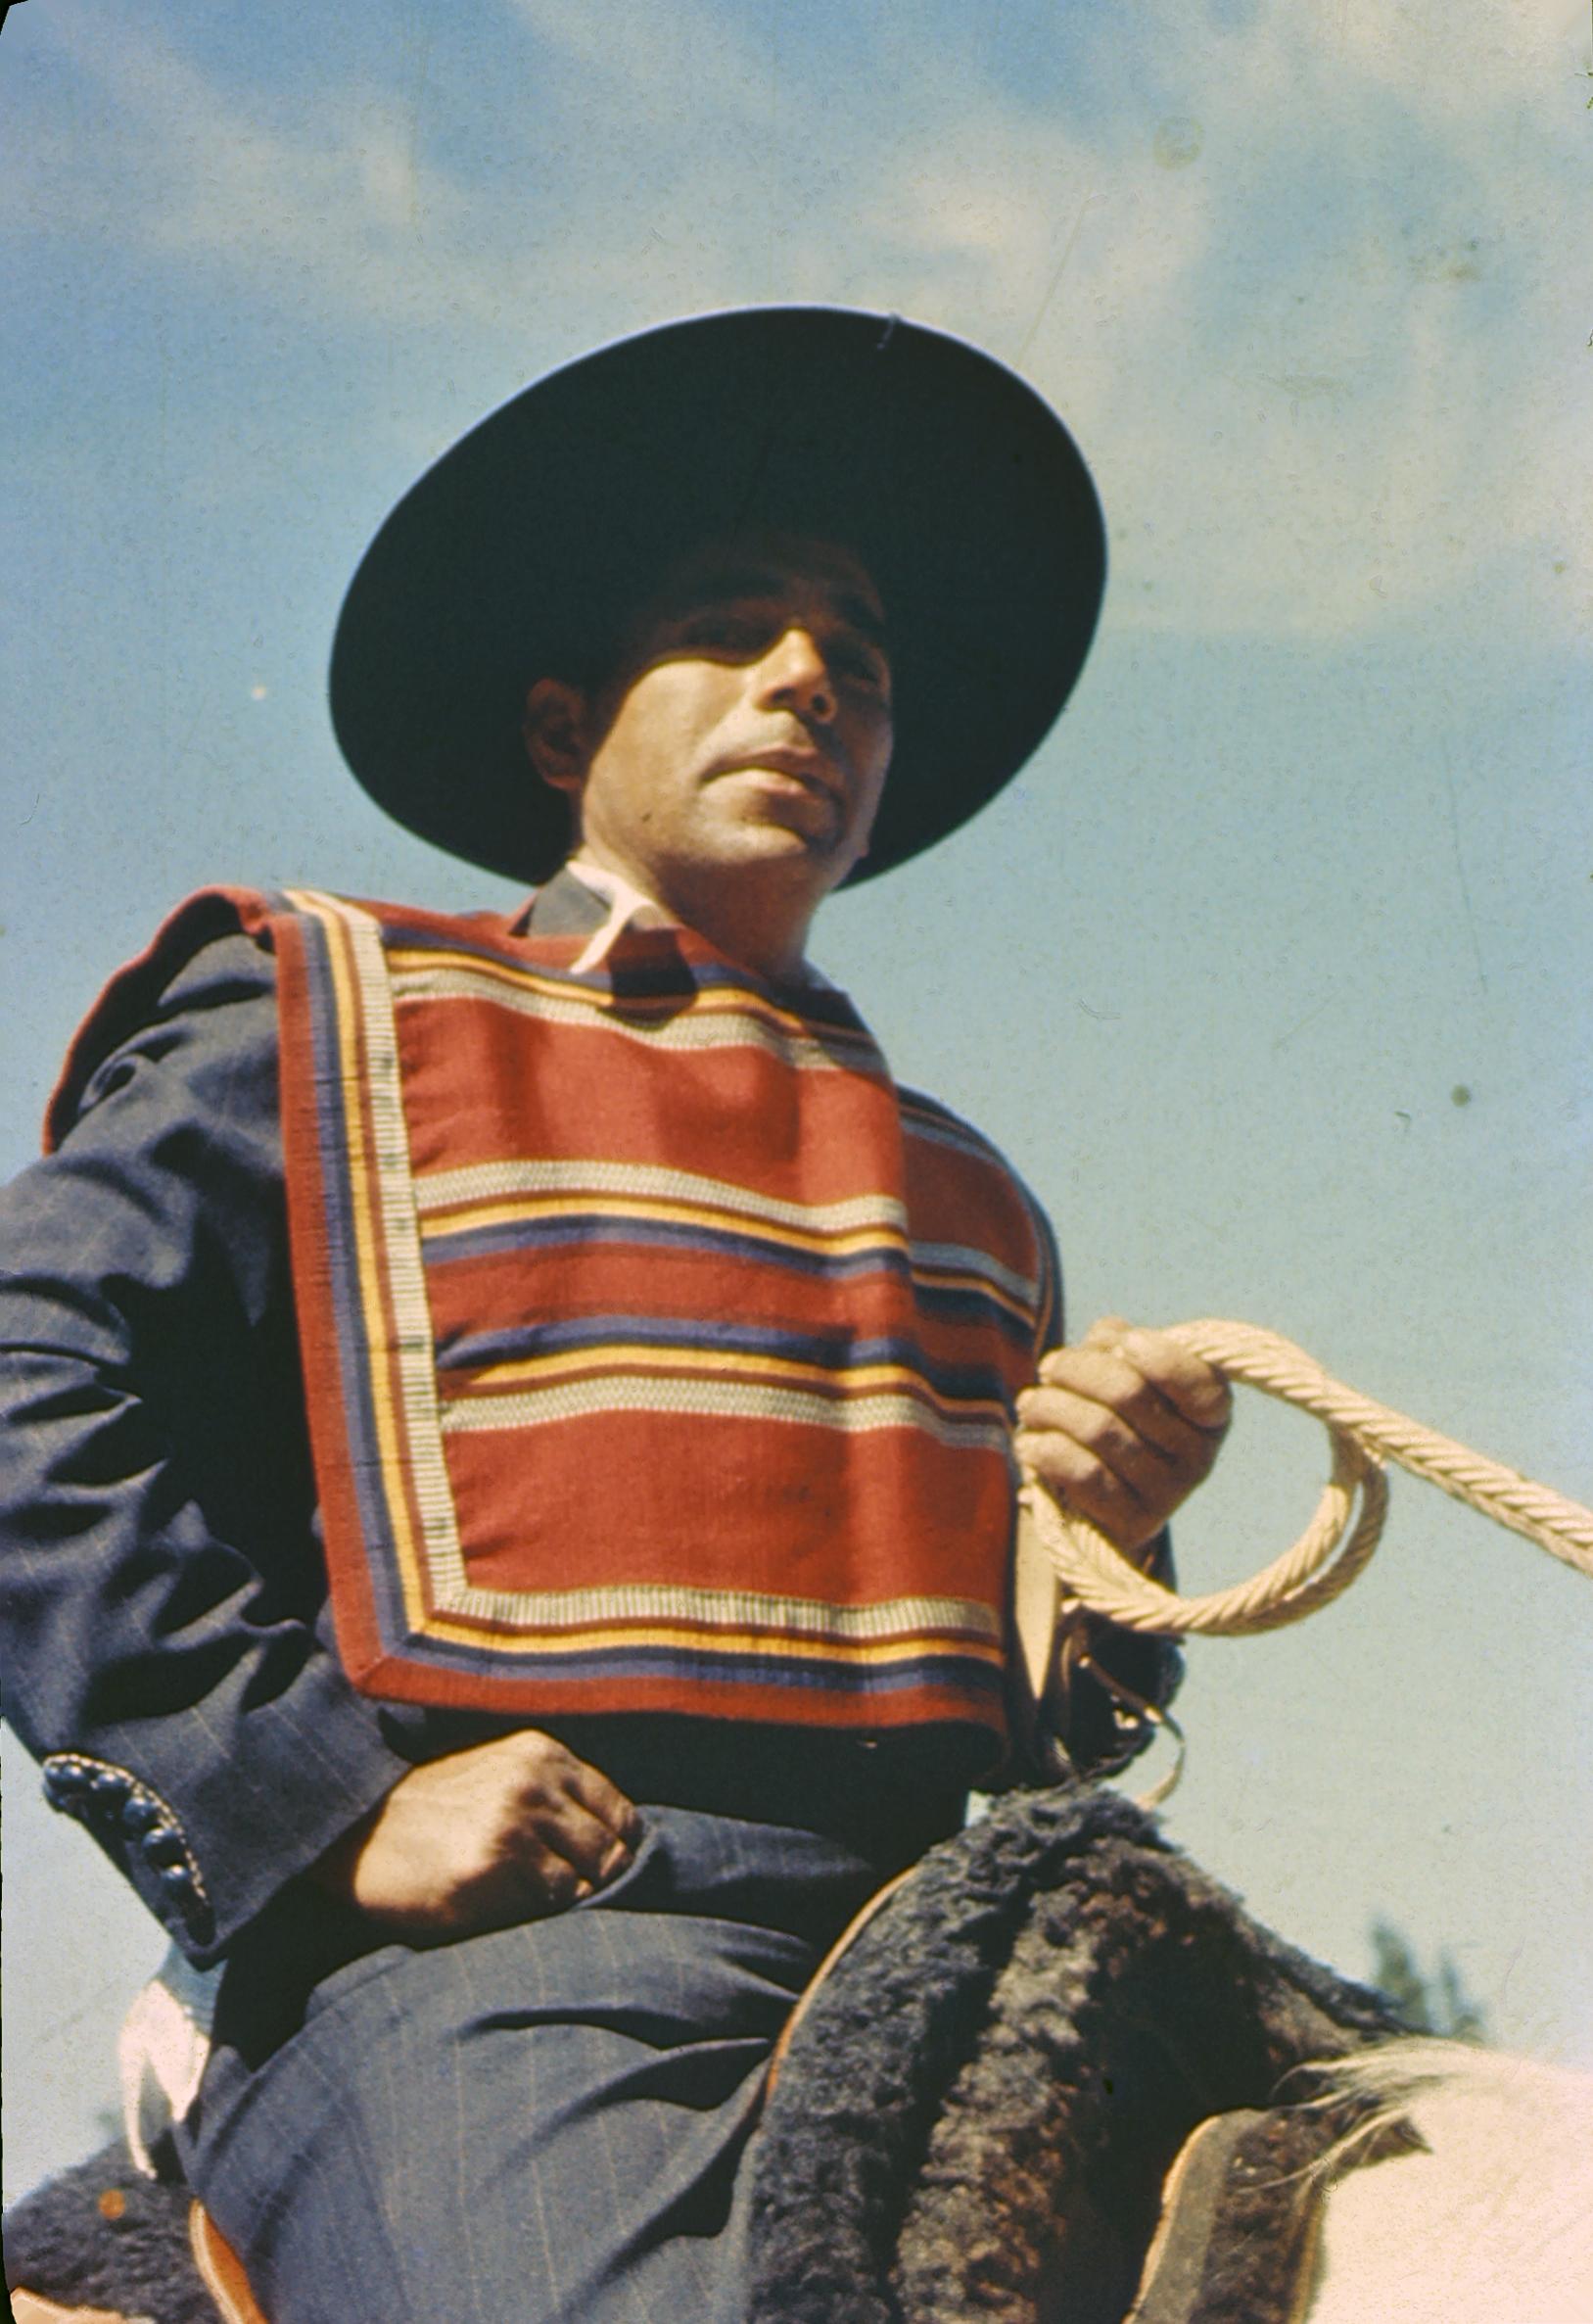 Enterreno - Fotos históricas de chile - fotos antiguas de Chile - Huaso chileno, 1960s